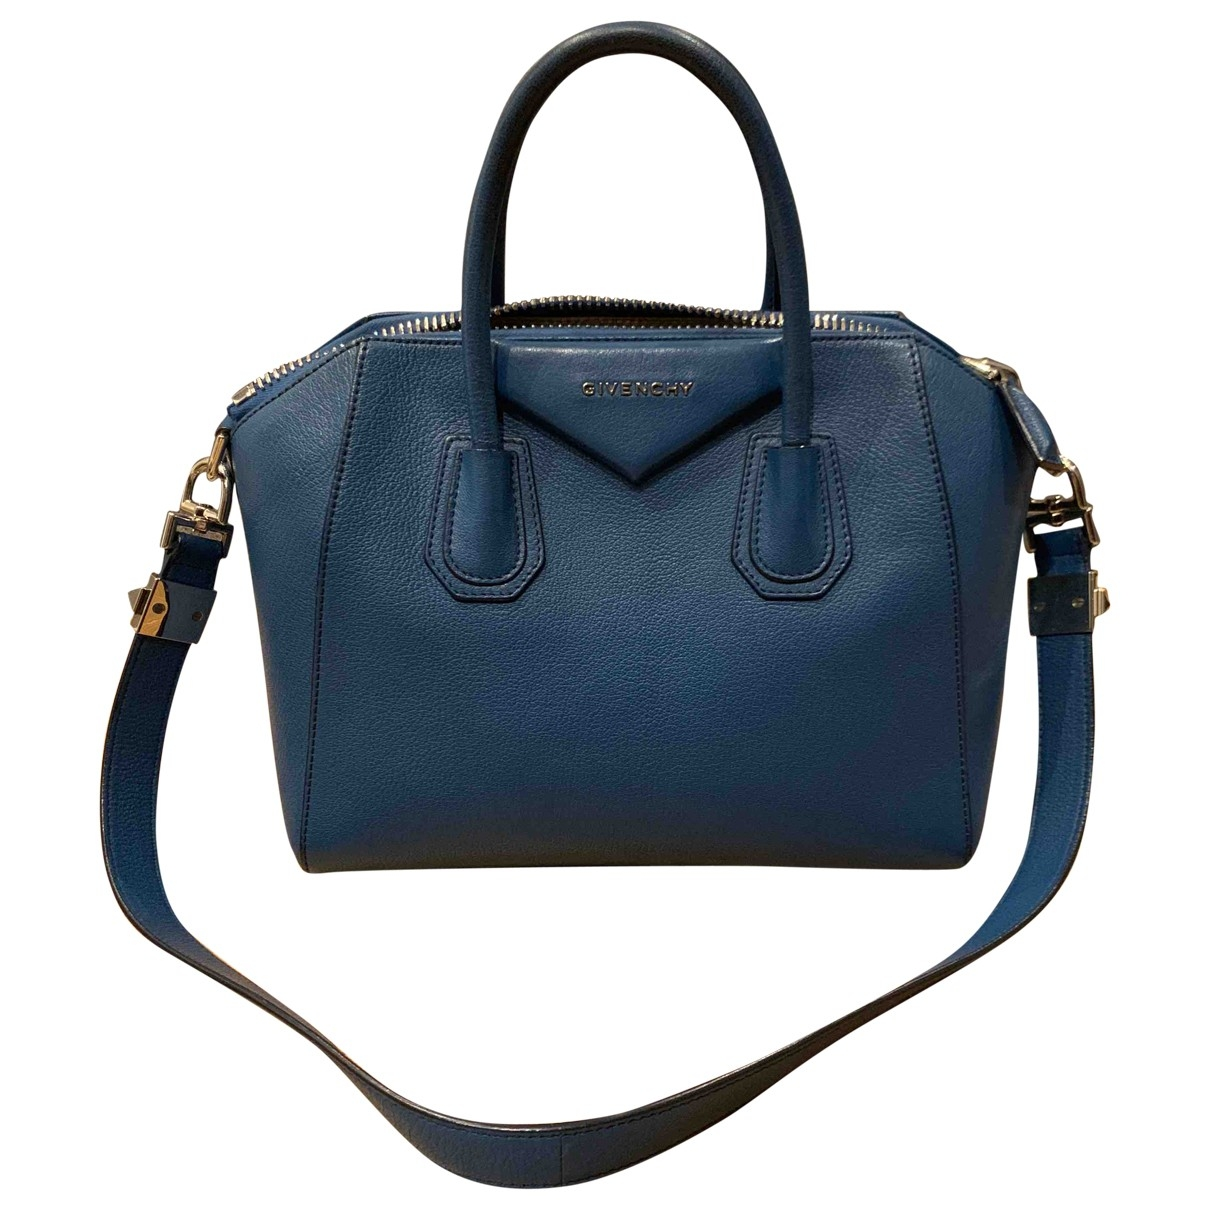 Givenchy Antigona Handtasche in  Blau Leder